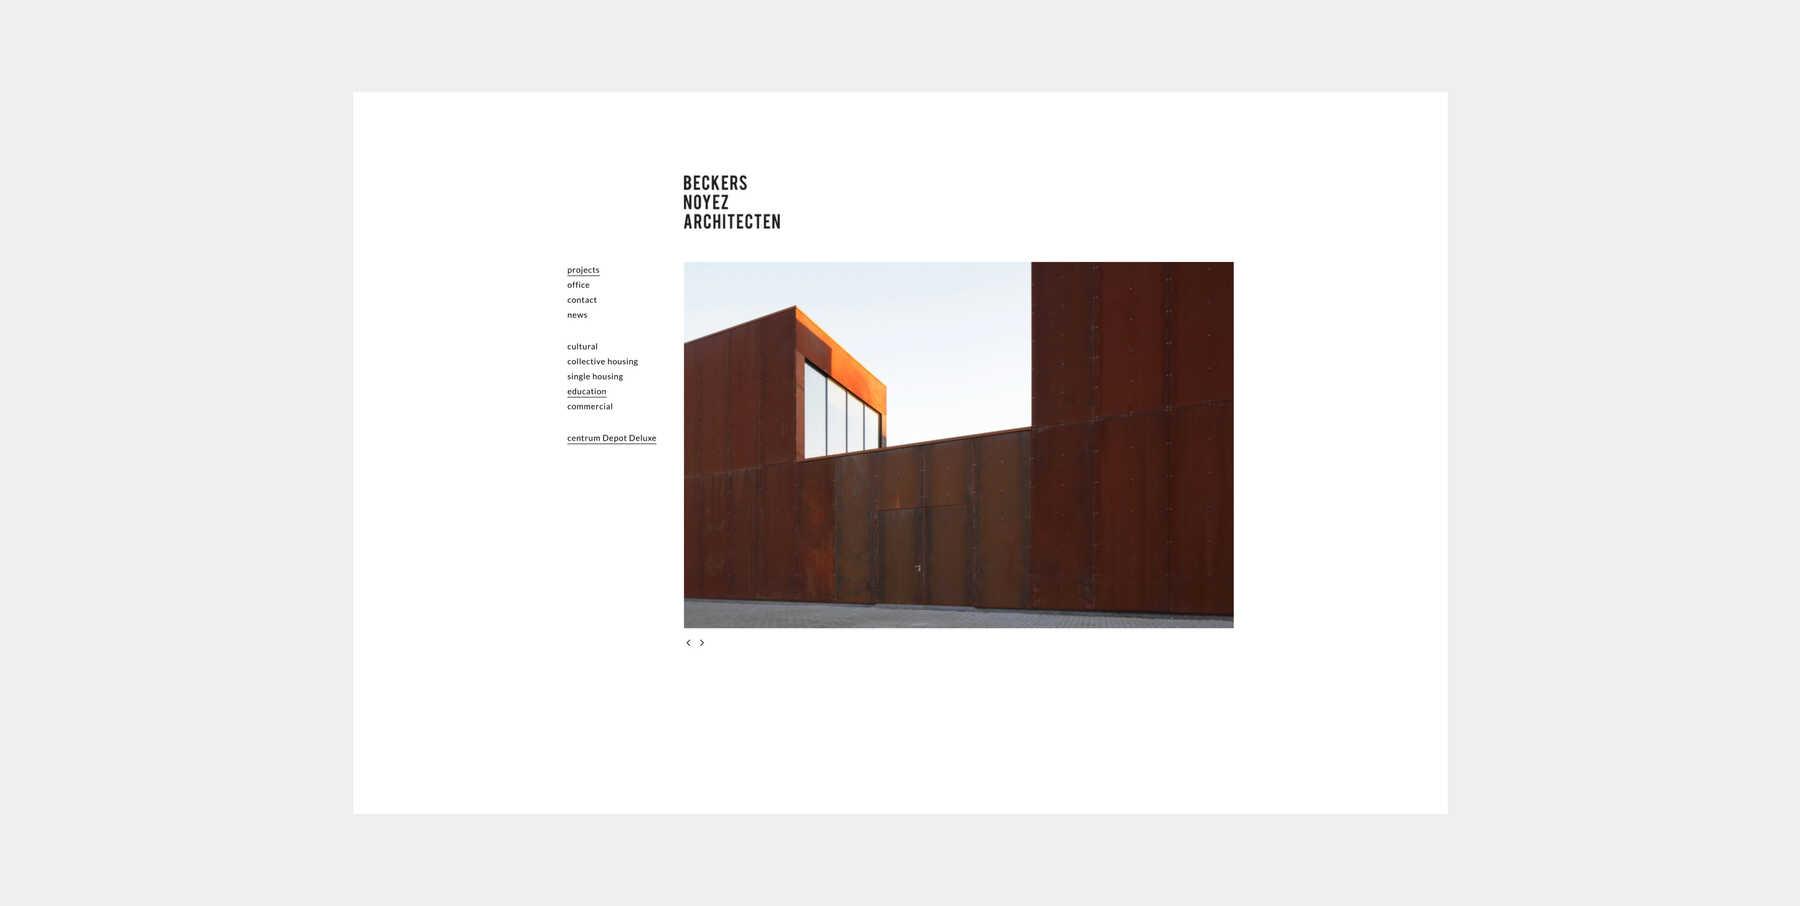 Beckers Noyez Architecten education project